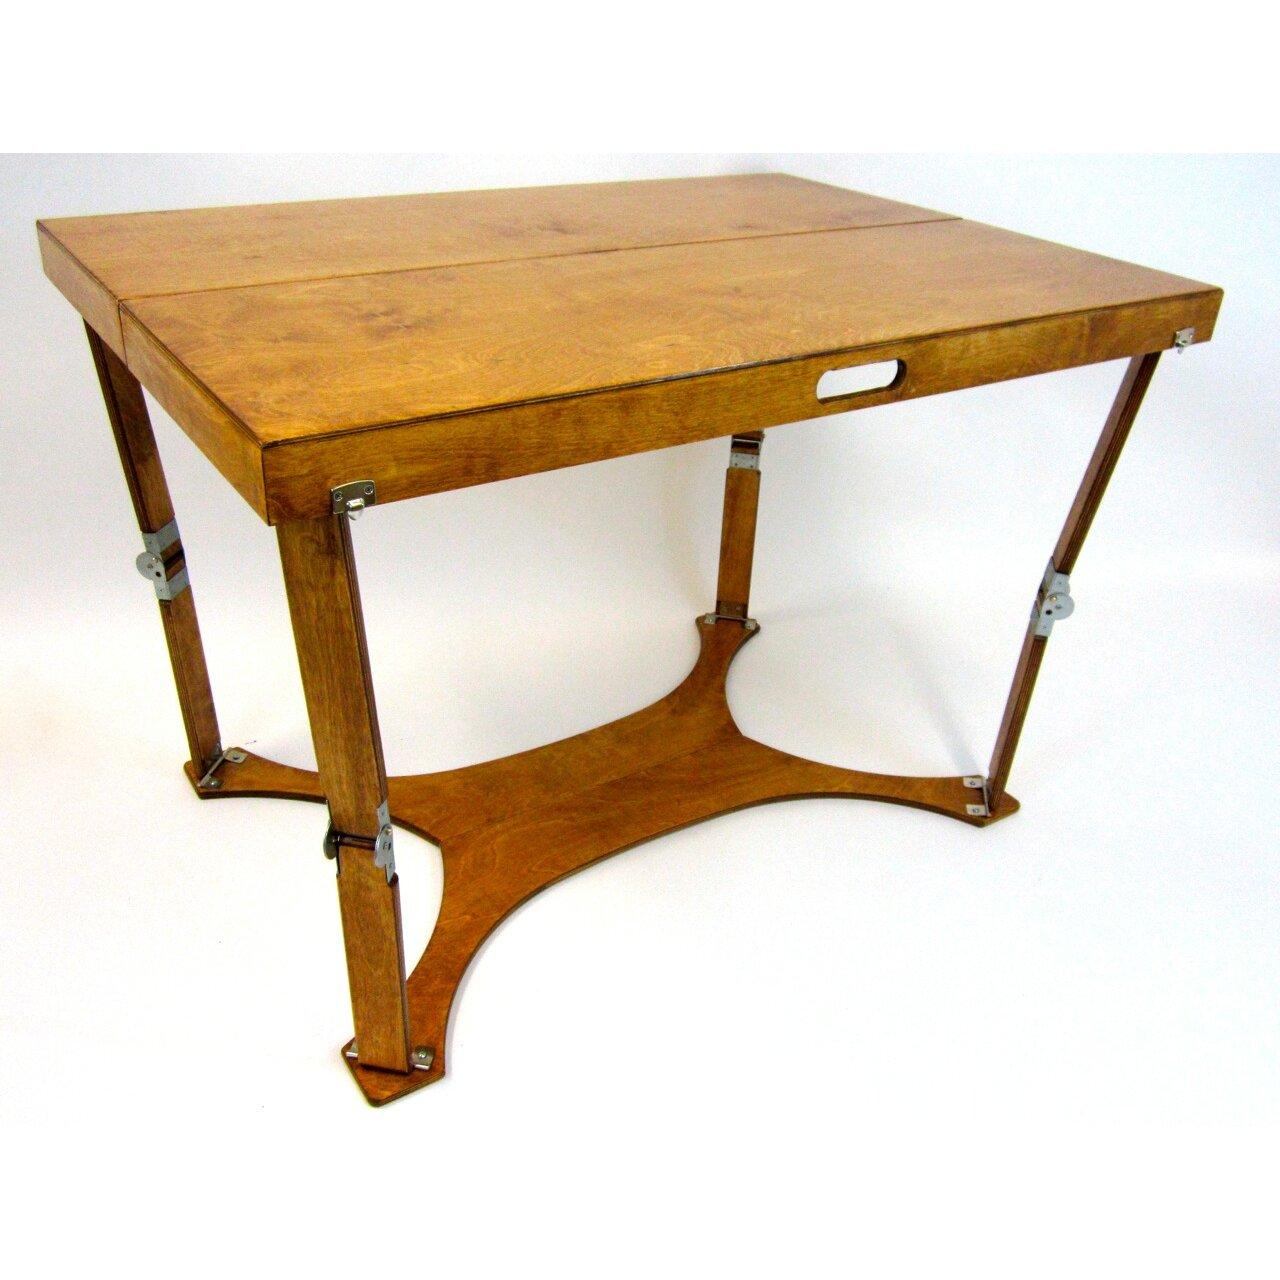 spiderlegs picnic folding dining table reviews wayfair. Black Bedroom Furniture Sets. Home Design Ideas